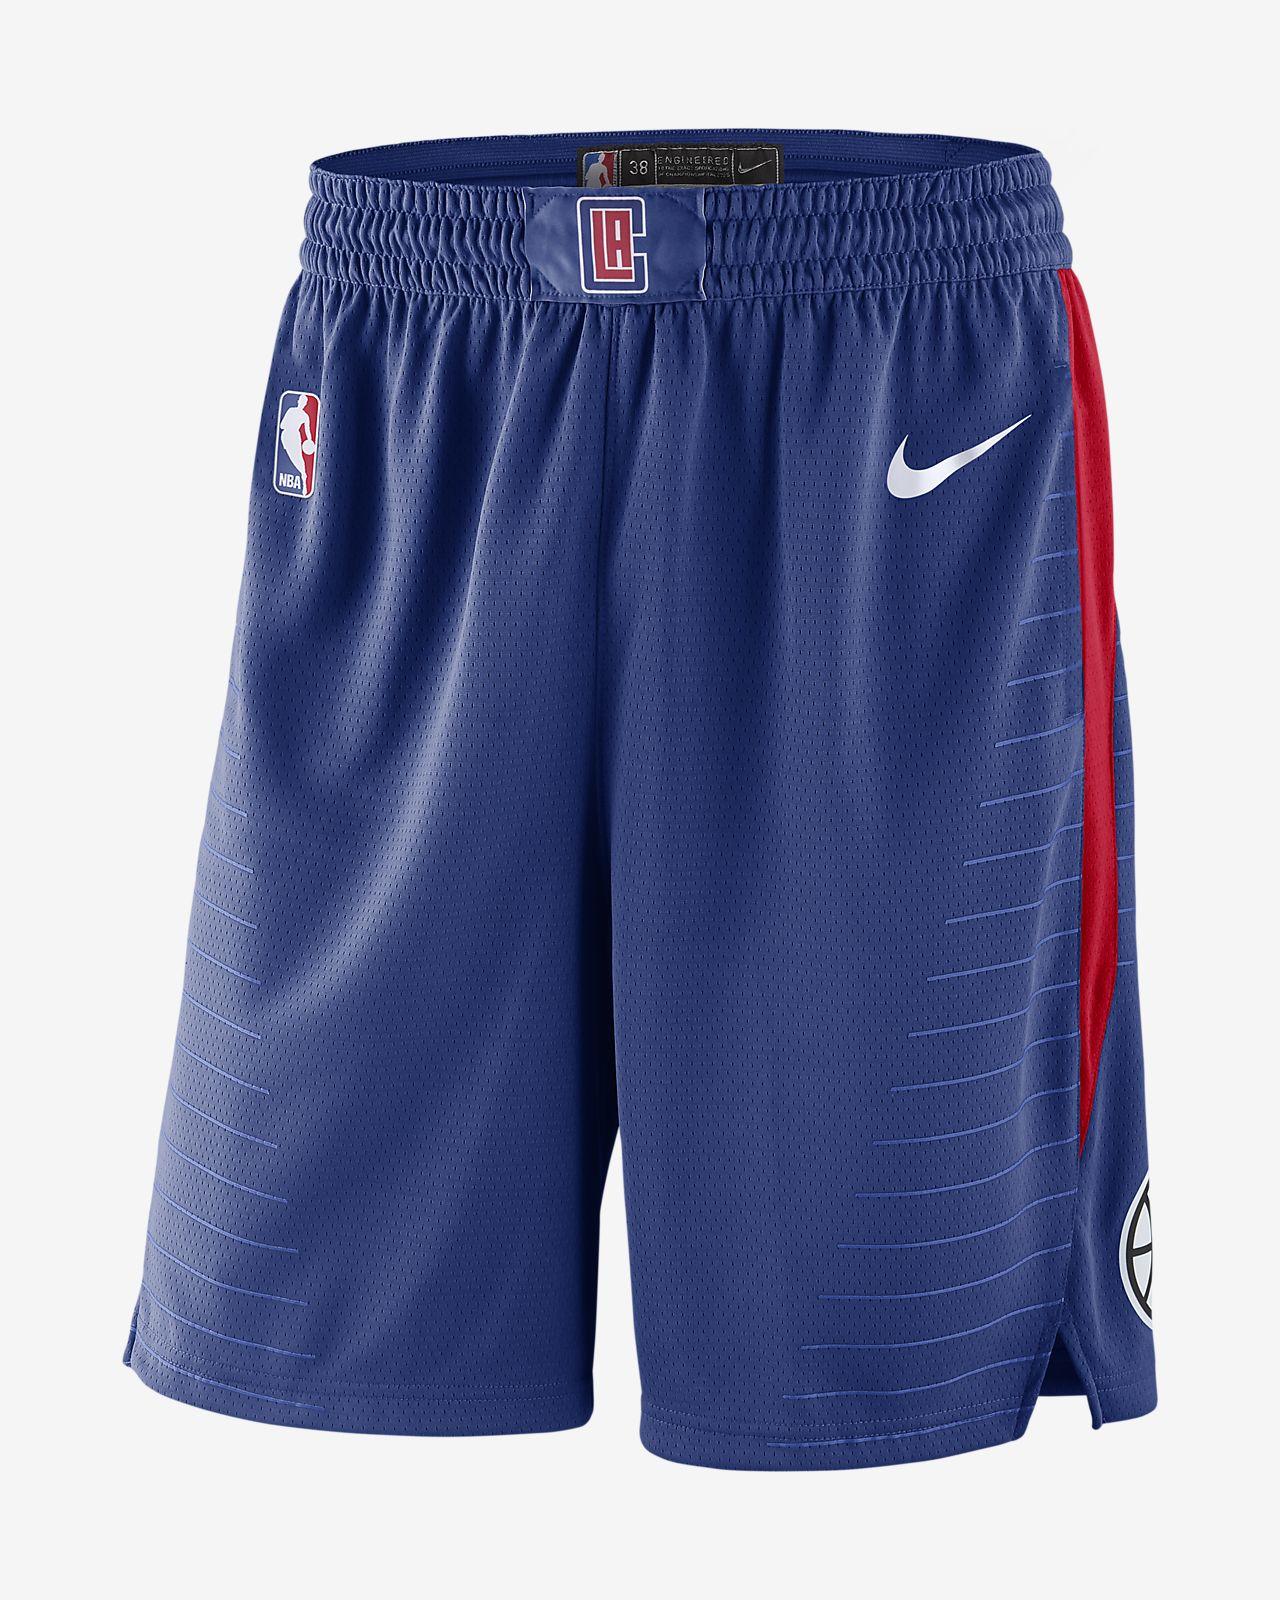 Shorts Los Angeles Clippers Icon Edition Swingman Nike NBA - Uomo